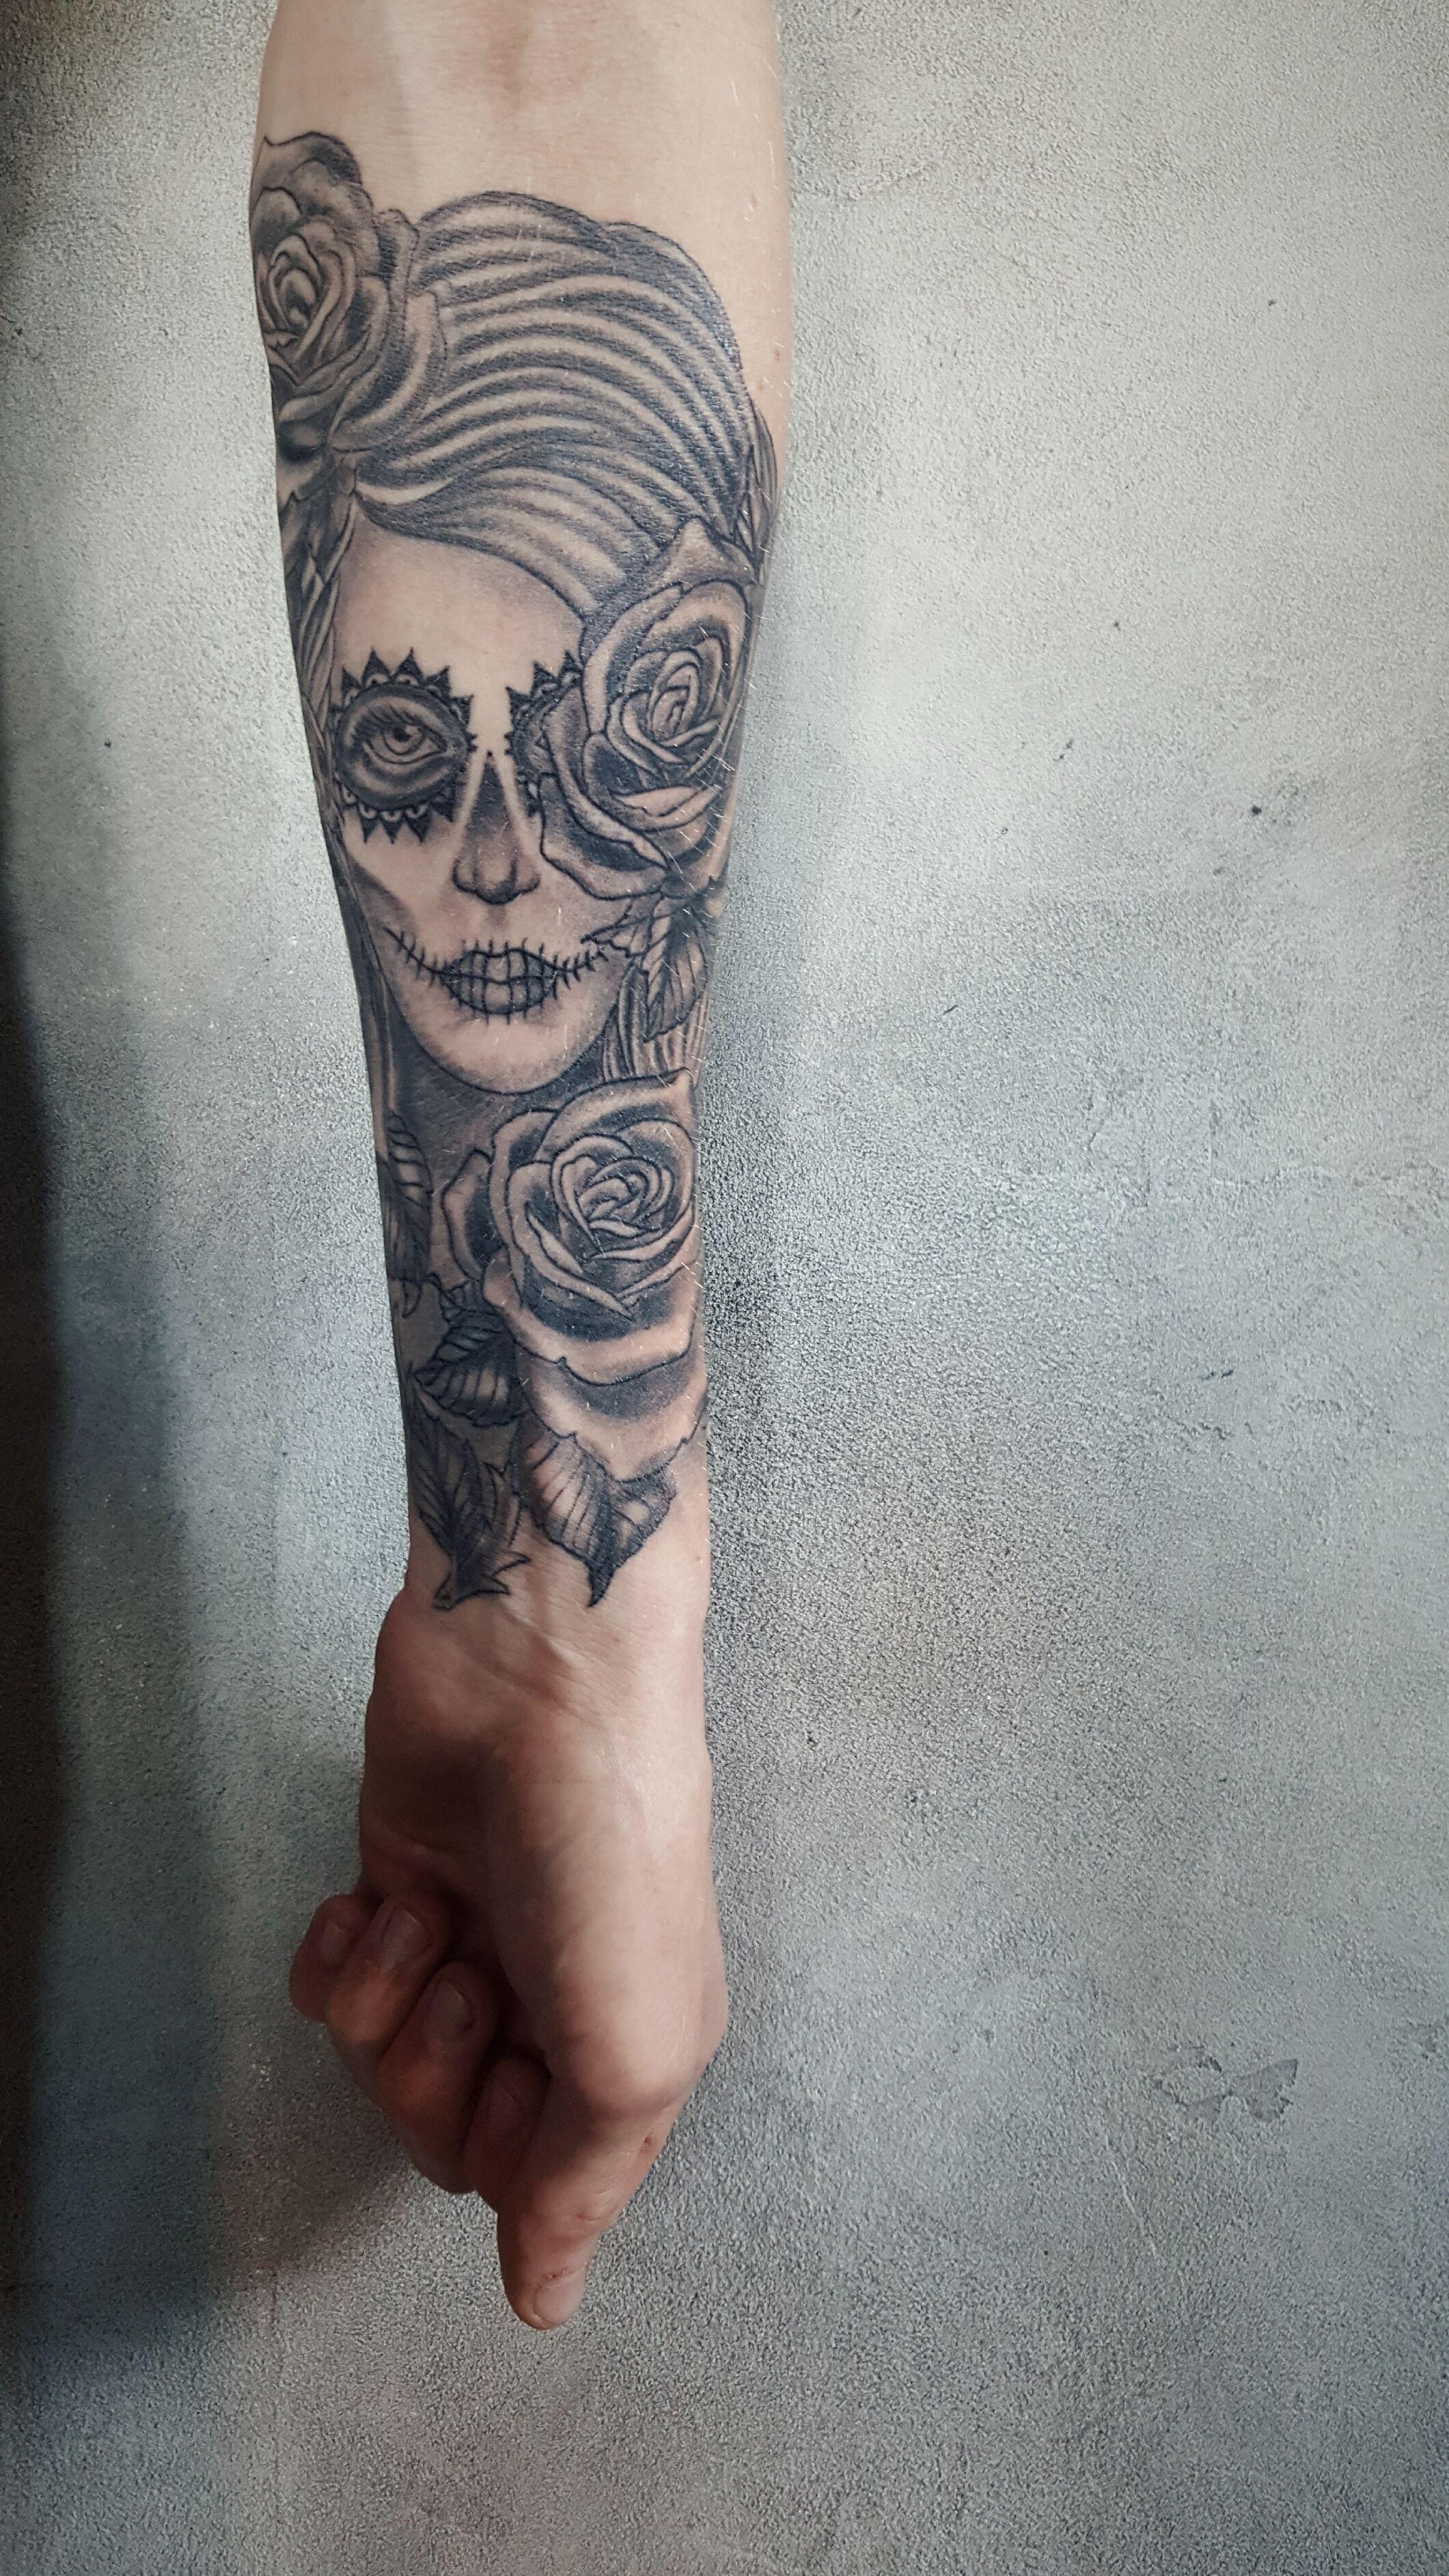 Tatouage Santa Muerte Catrina Tattoo Avant Bras Homme Tatouage